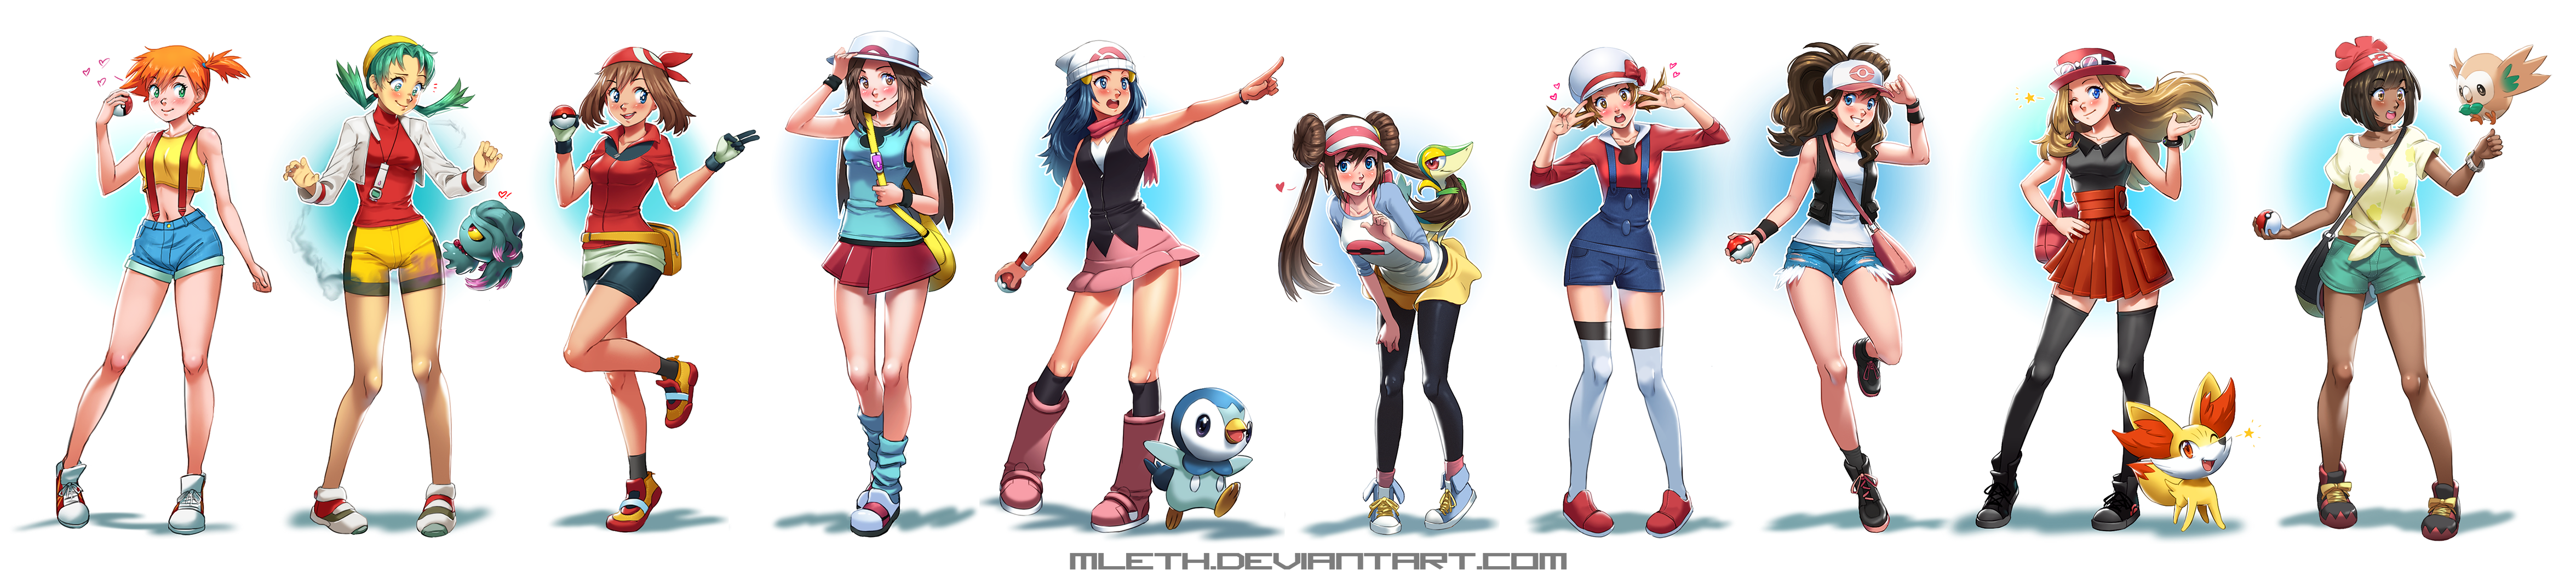 Pokémon Trainer  Bulbapedia the communitydriven Pokémon